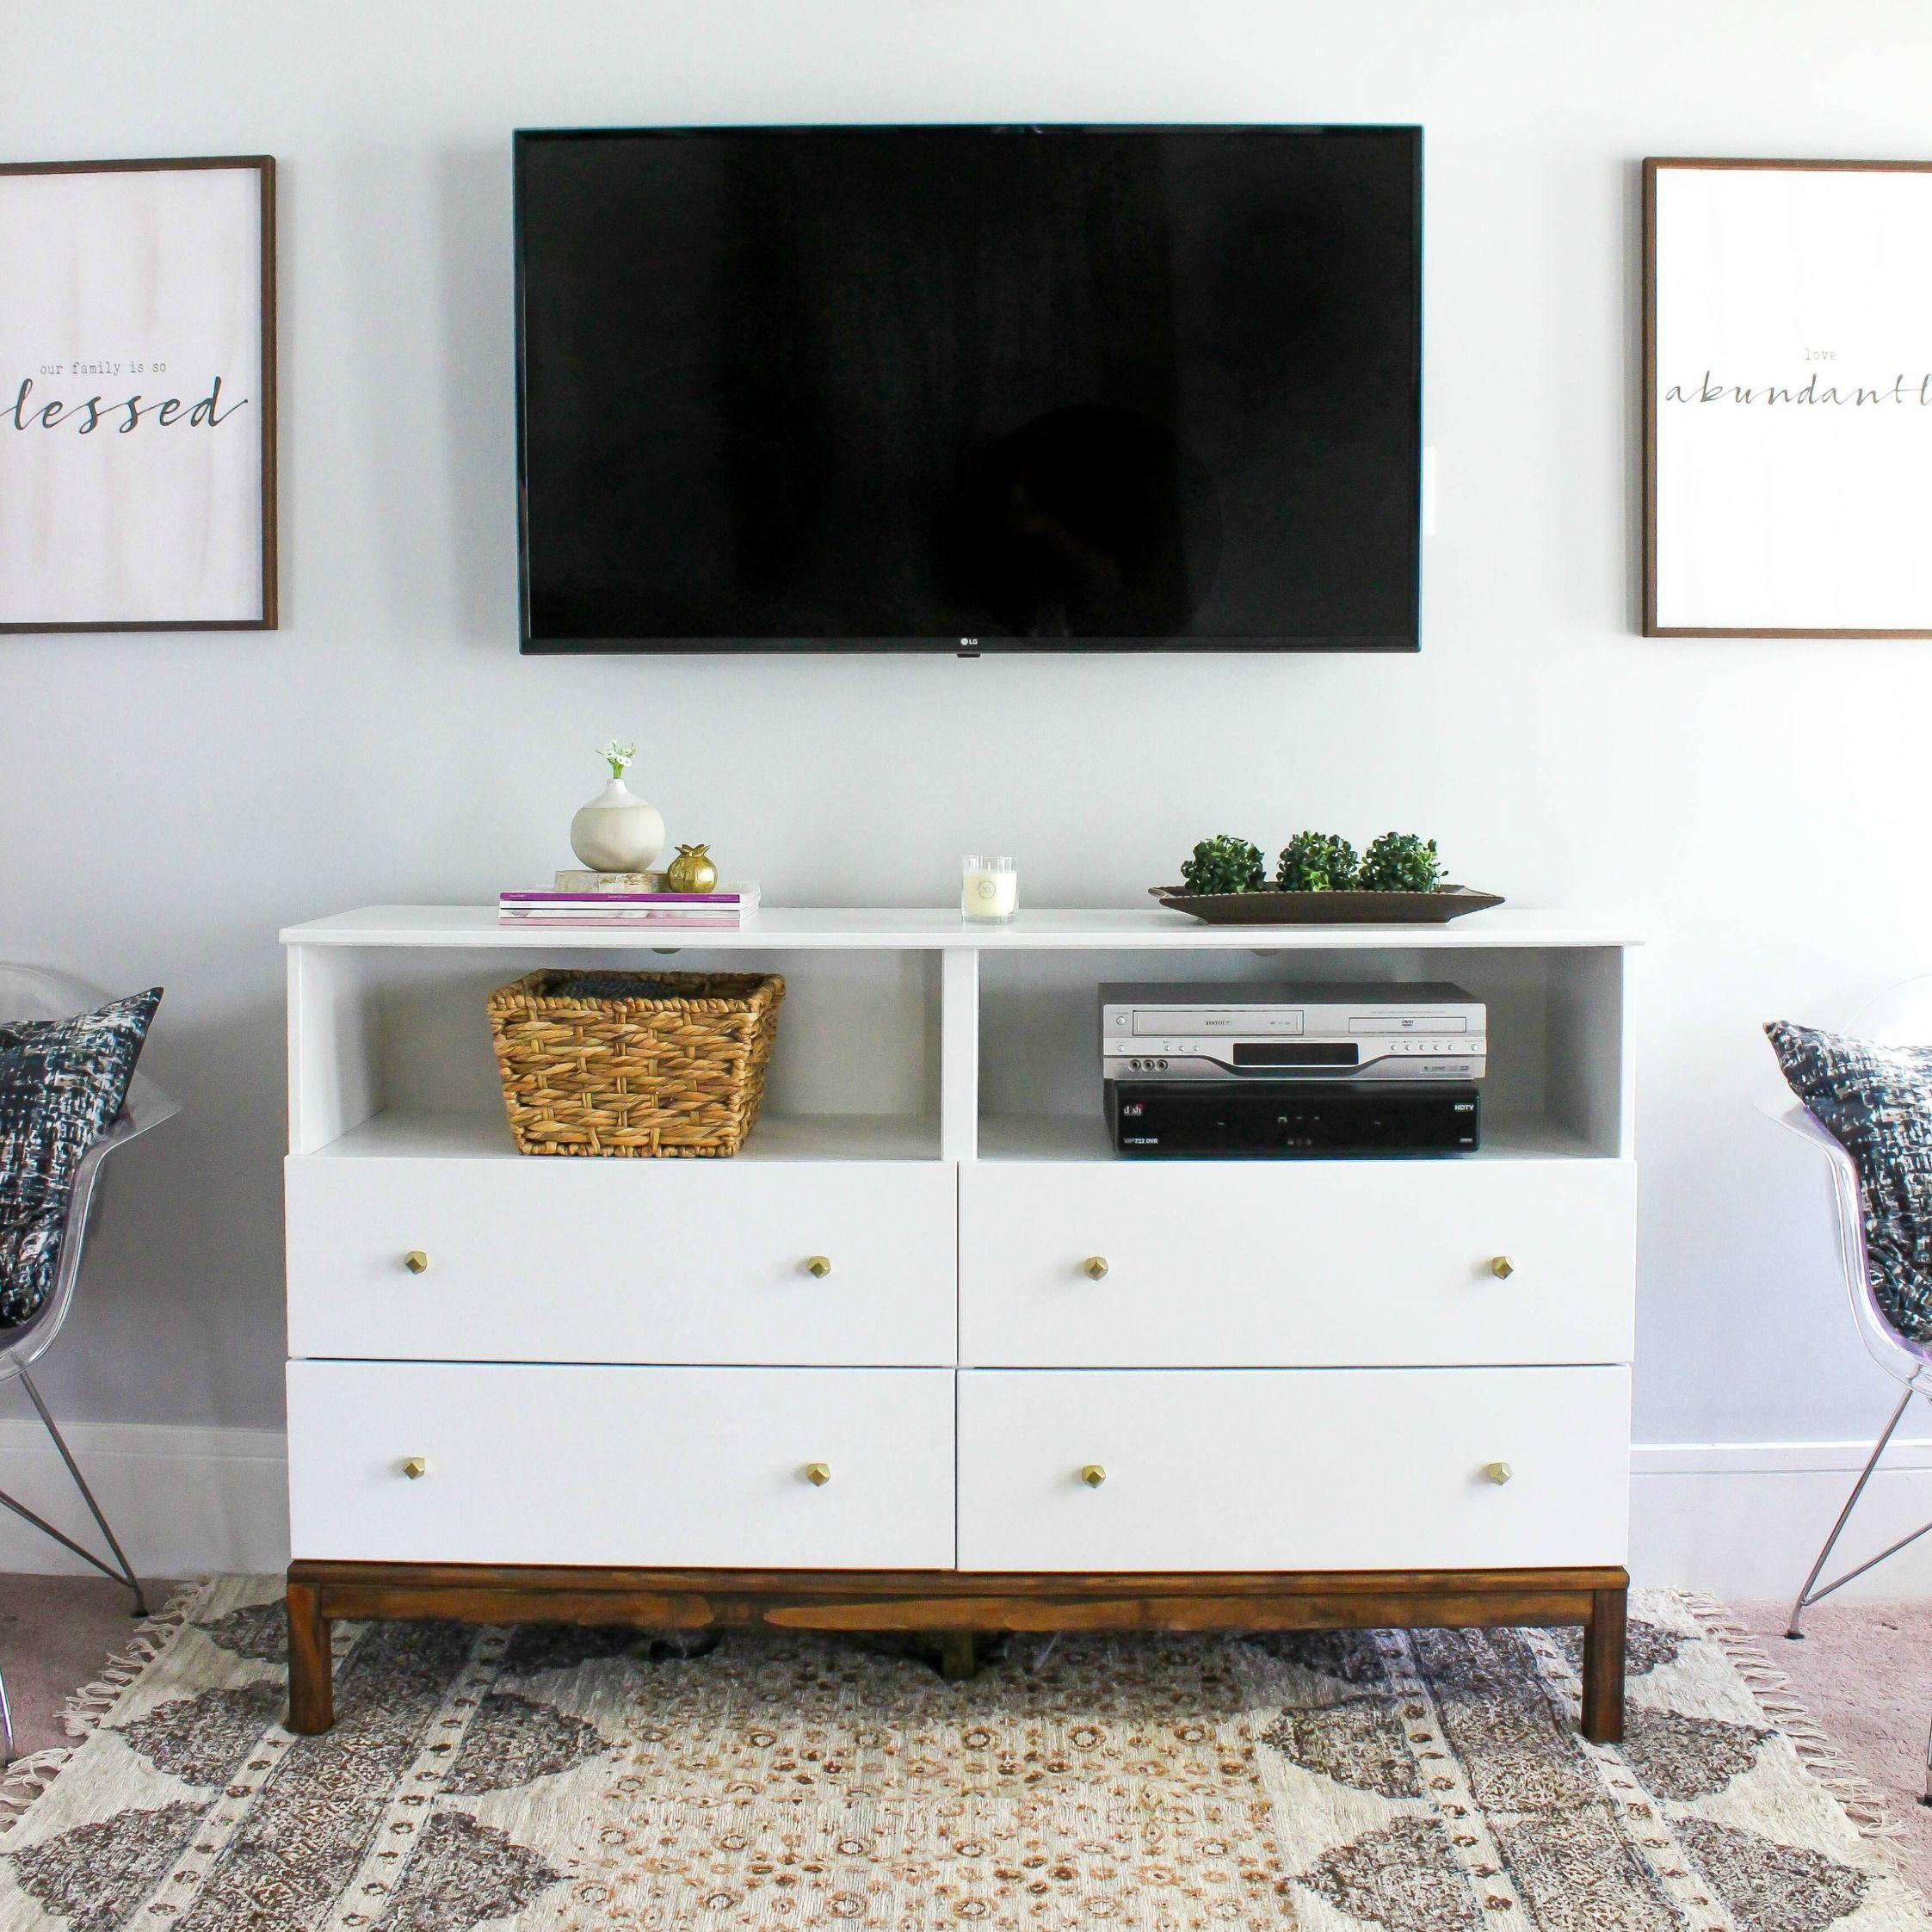 IKEA Dresser to TV Stand Transformation | Ikea dresser, Tv stands ...